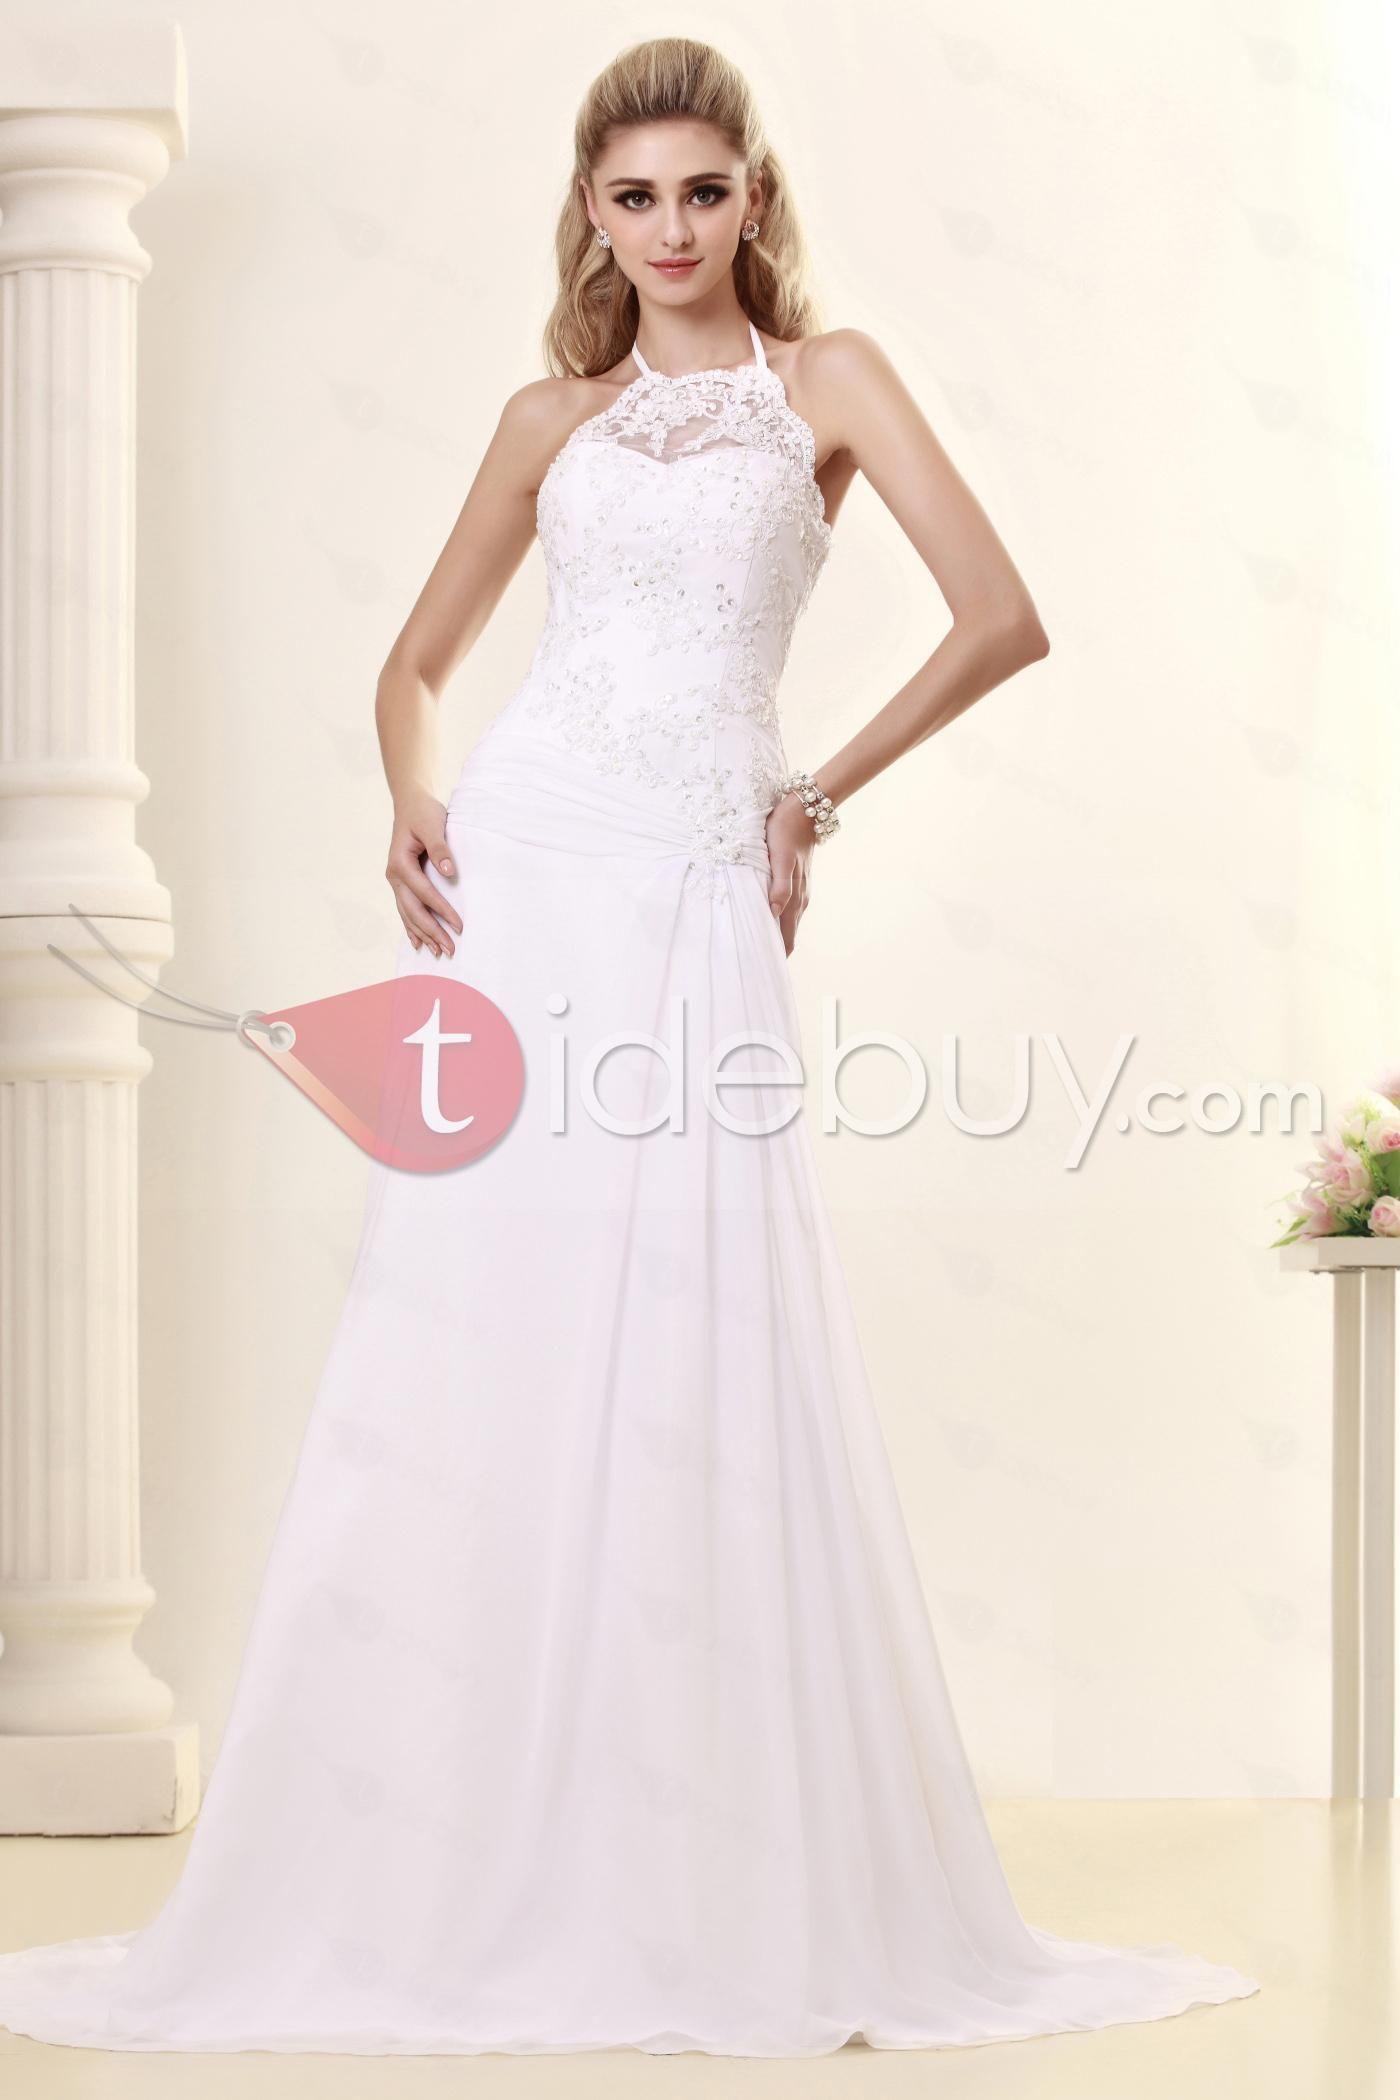 Fancy sheathcolumn highneck sweep train dashaus wedding dress